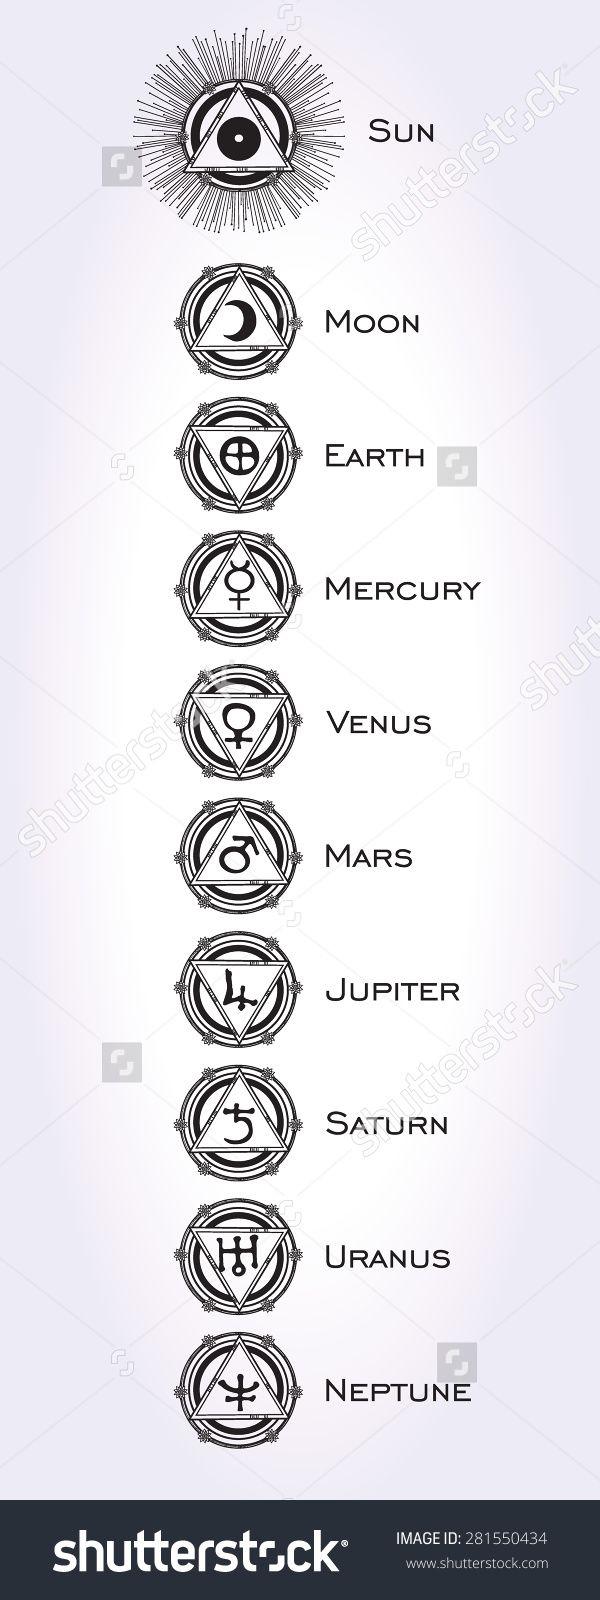 astronomy symbols tattoo - photo #15